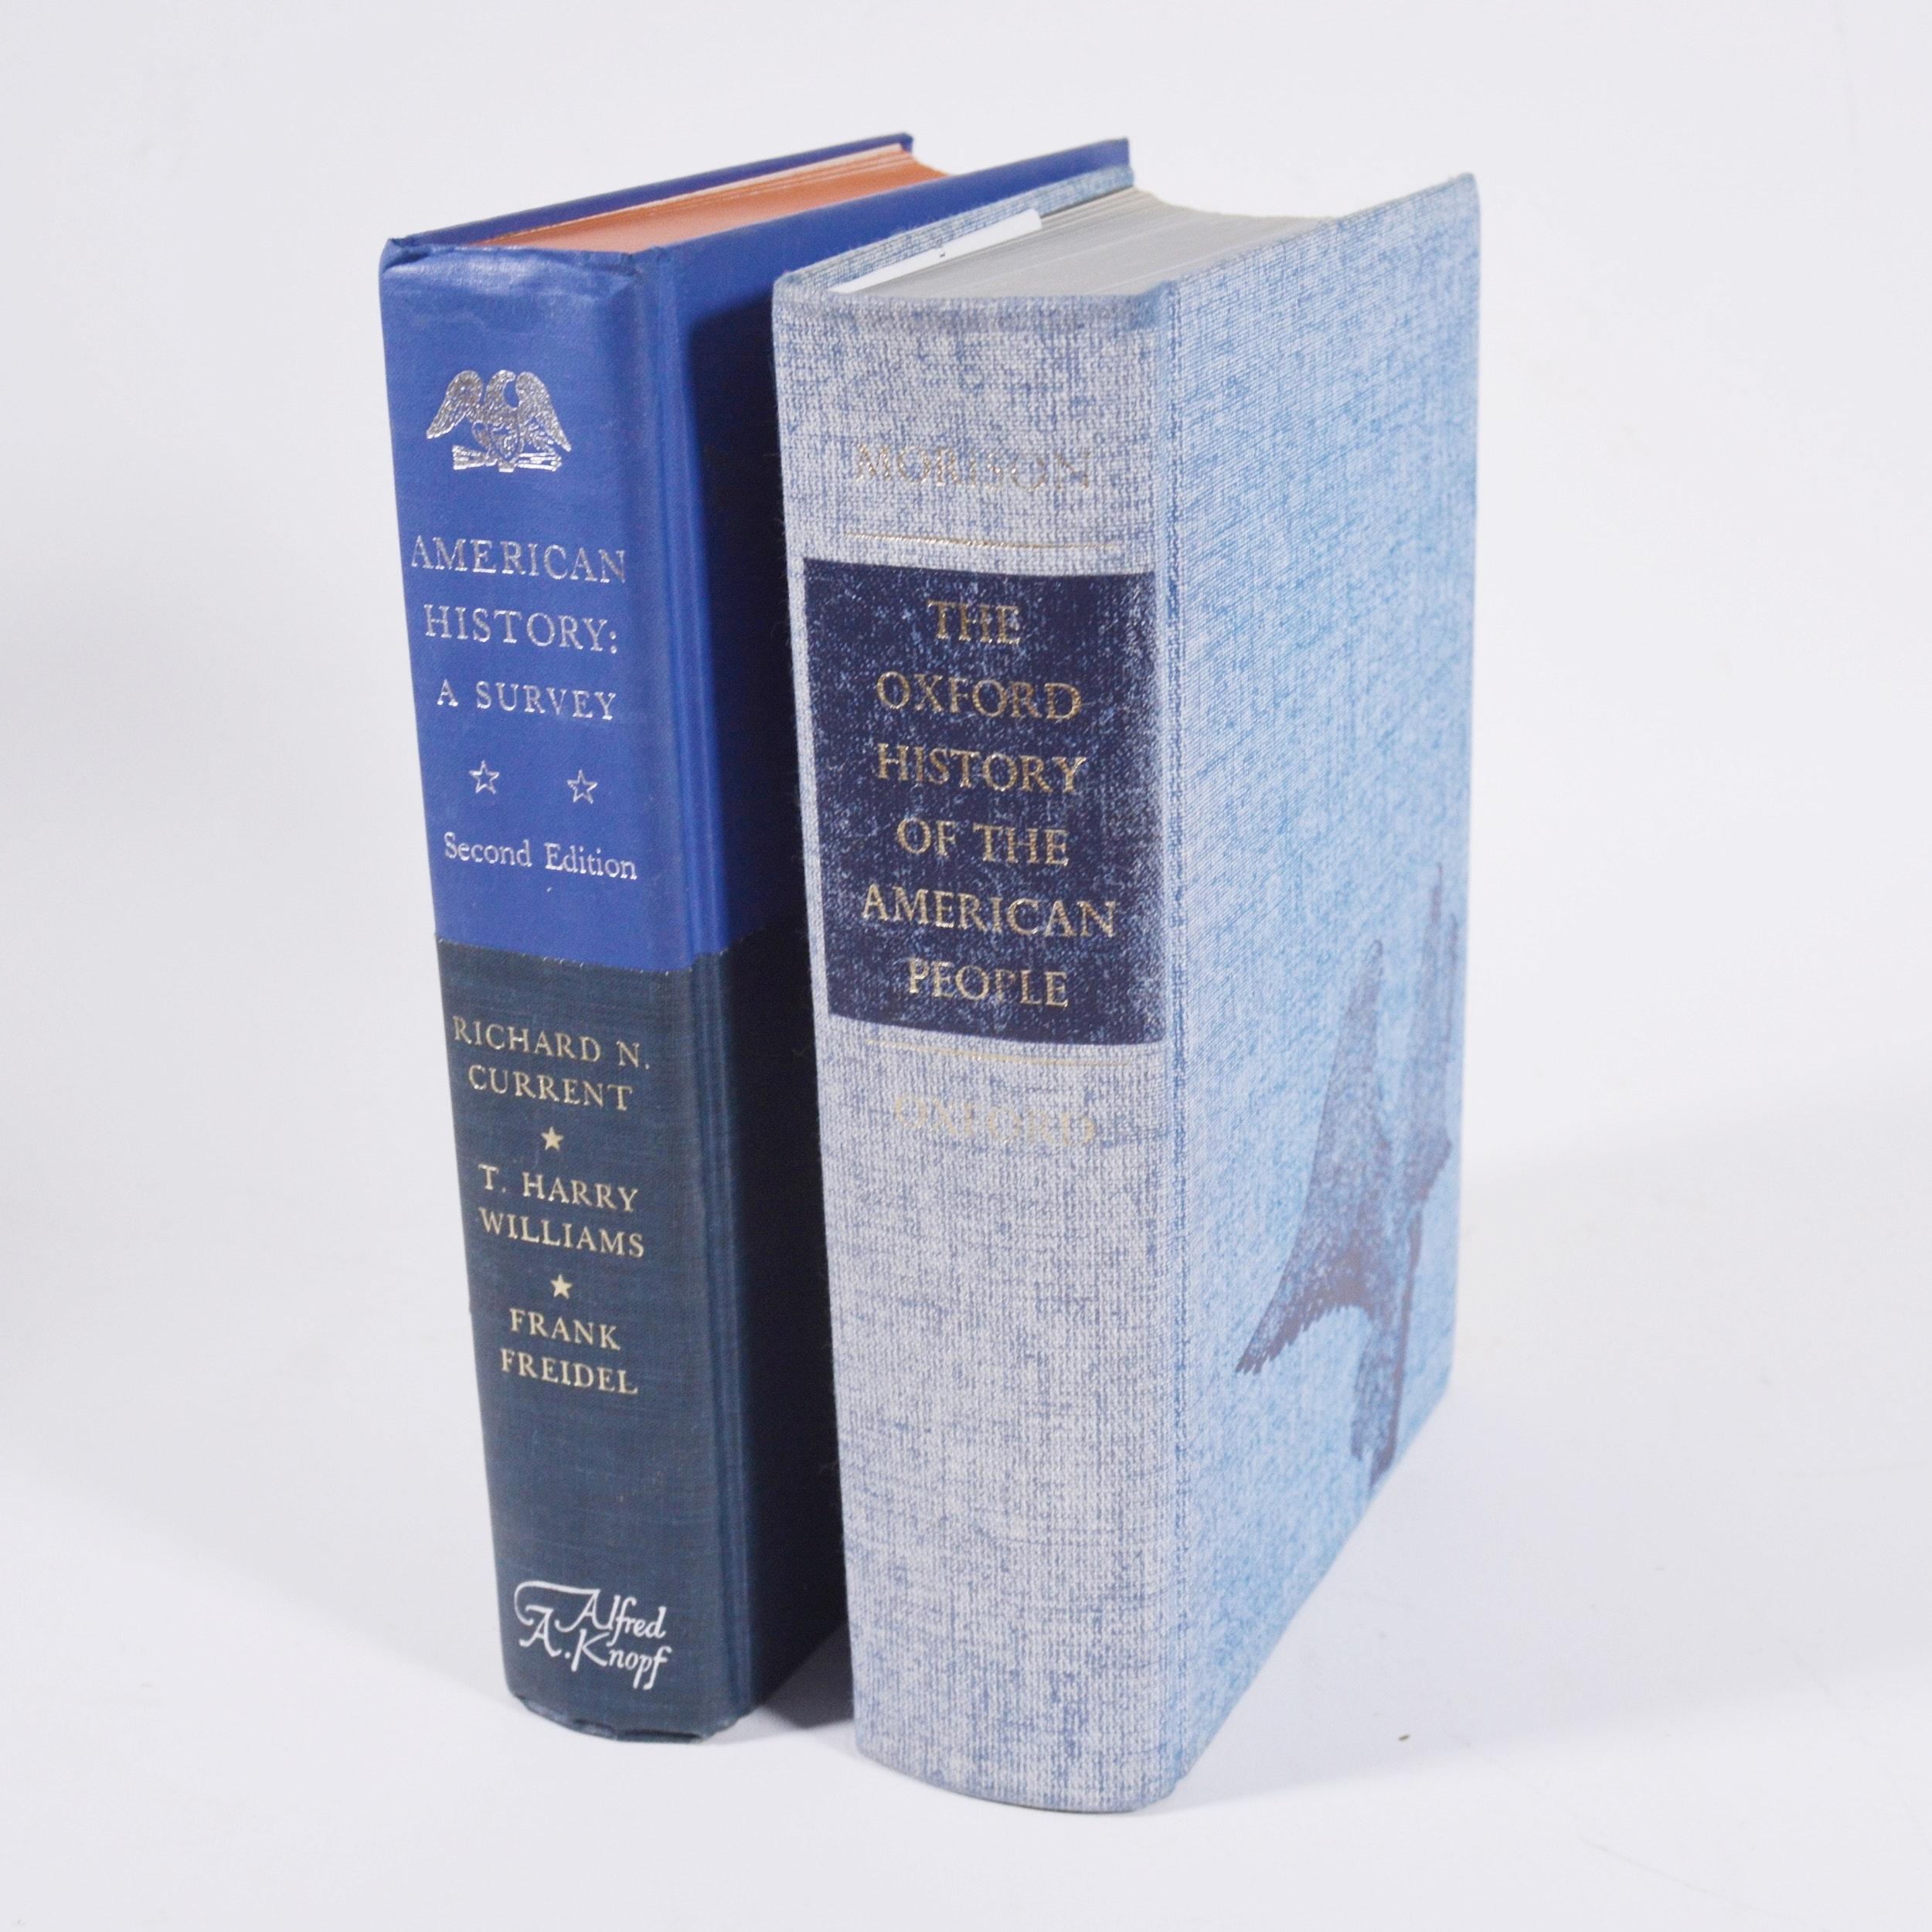 American History Hardcover Books